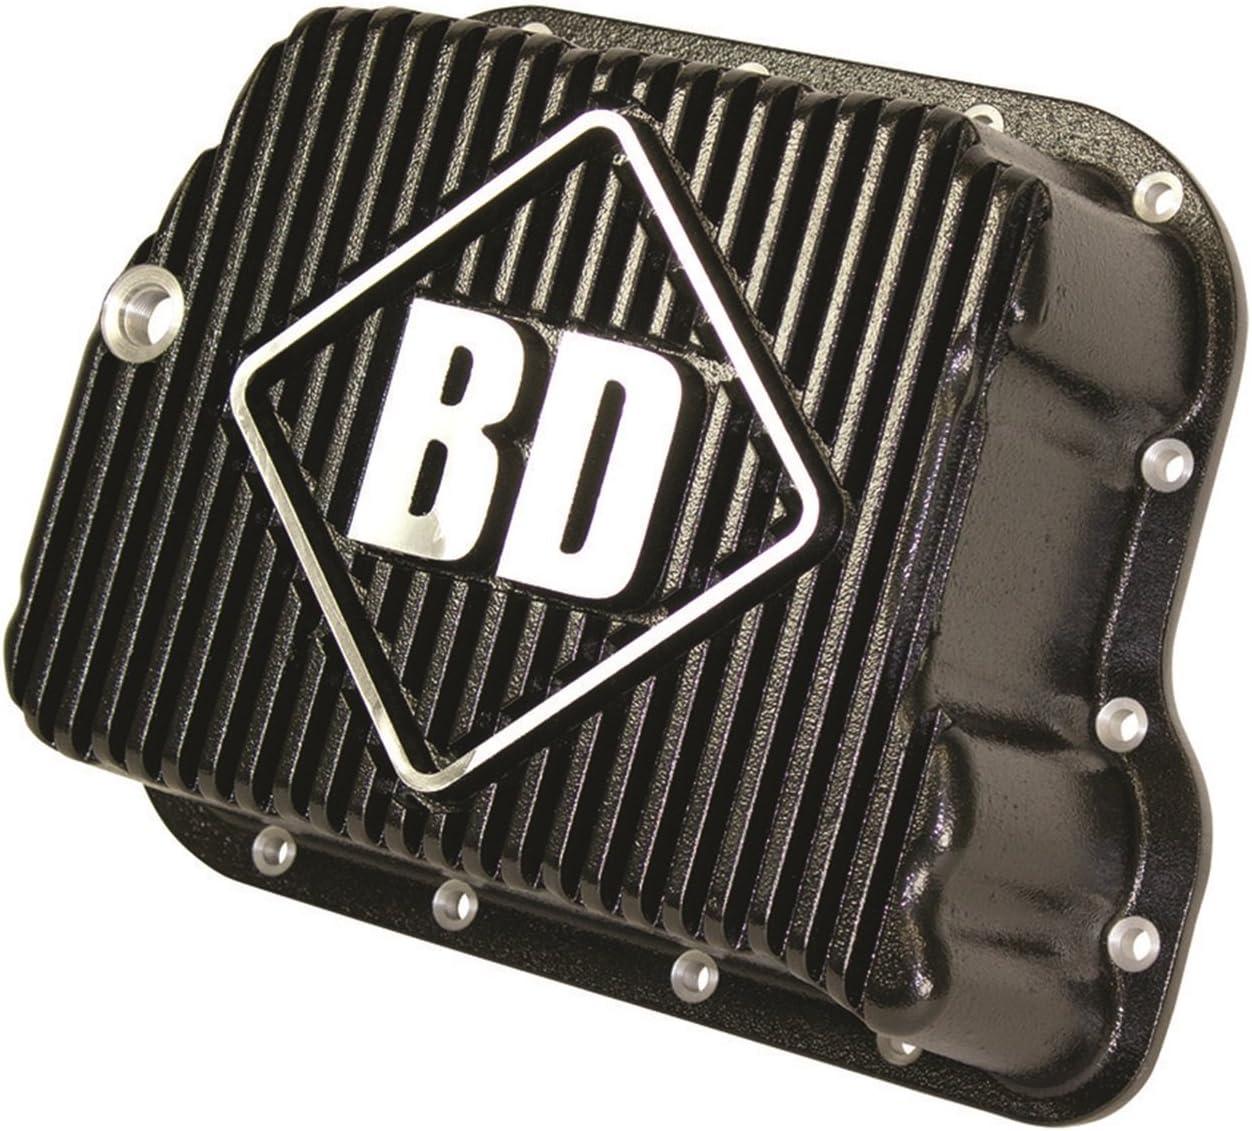 BD Diesel 1061501 Deep Sump Transmission Pan Holds 2 Quarts Incl. Pan w/Temp. Sending Unit Port/Pan Gasket/Magnetic Drain Plug//Hardware Deep Sump Transmission Pan